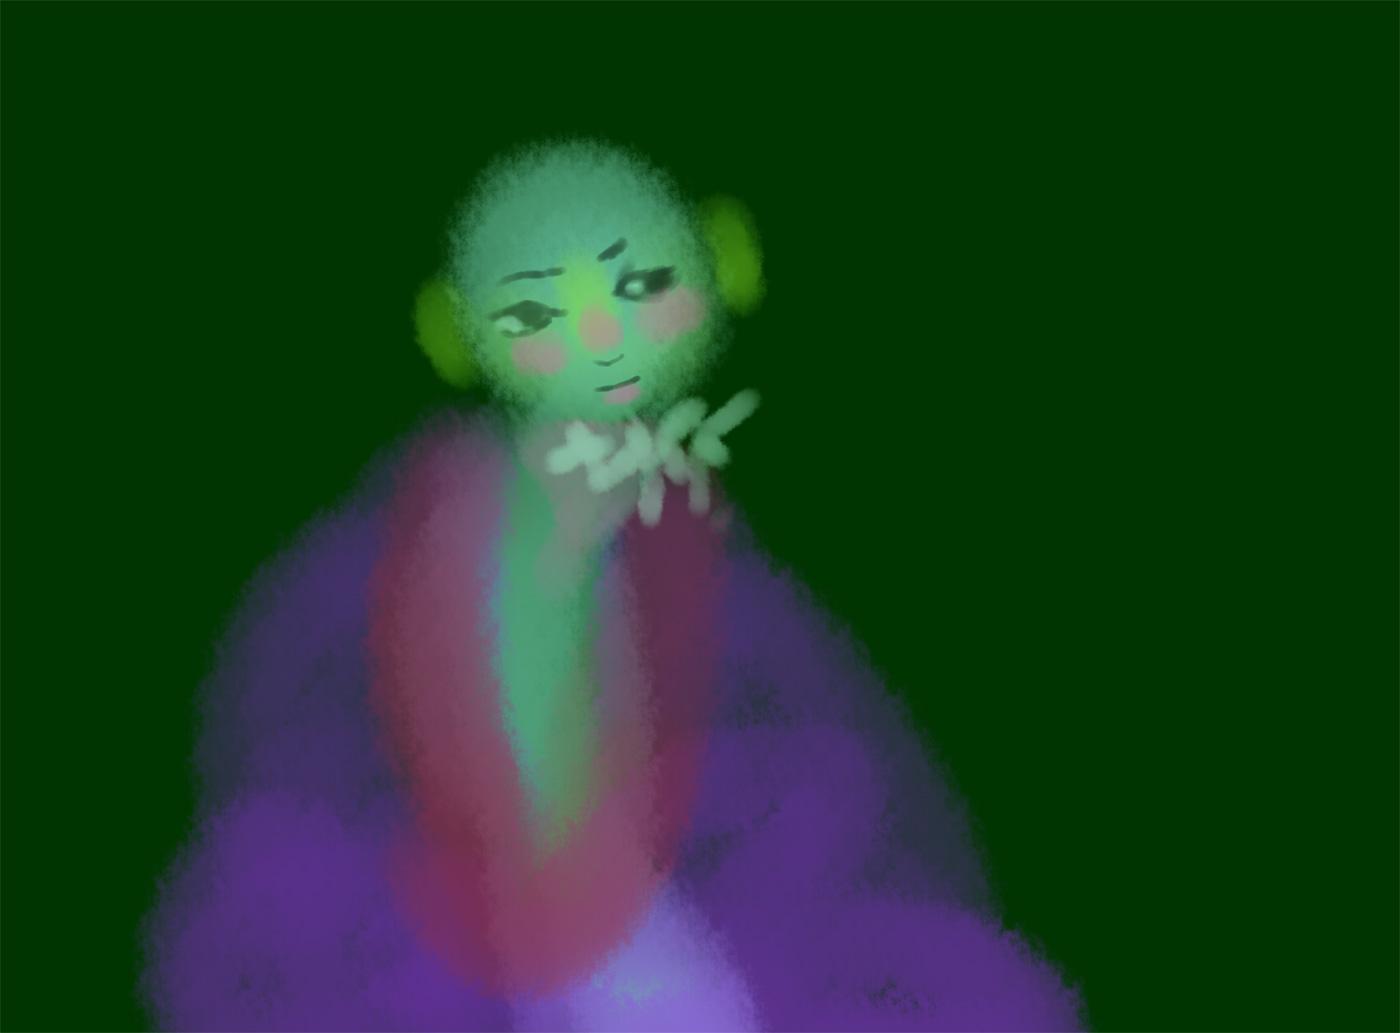 http://ahito.com/comic/ehon/voice/img//2018/20180130/06.jpg